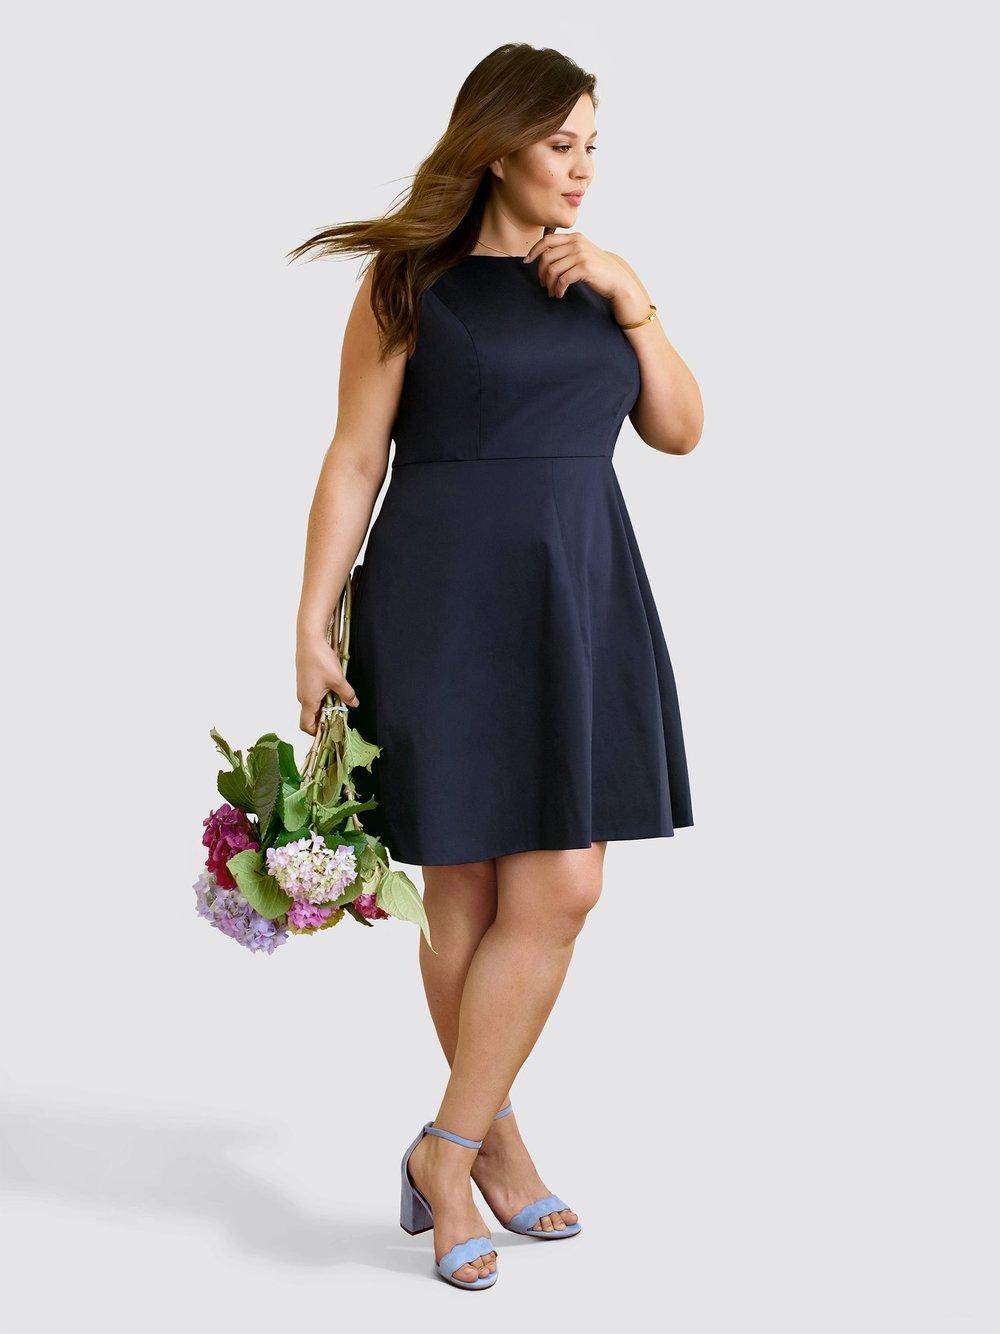 Draper James , Sleeveless Love Circle Dress, $125